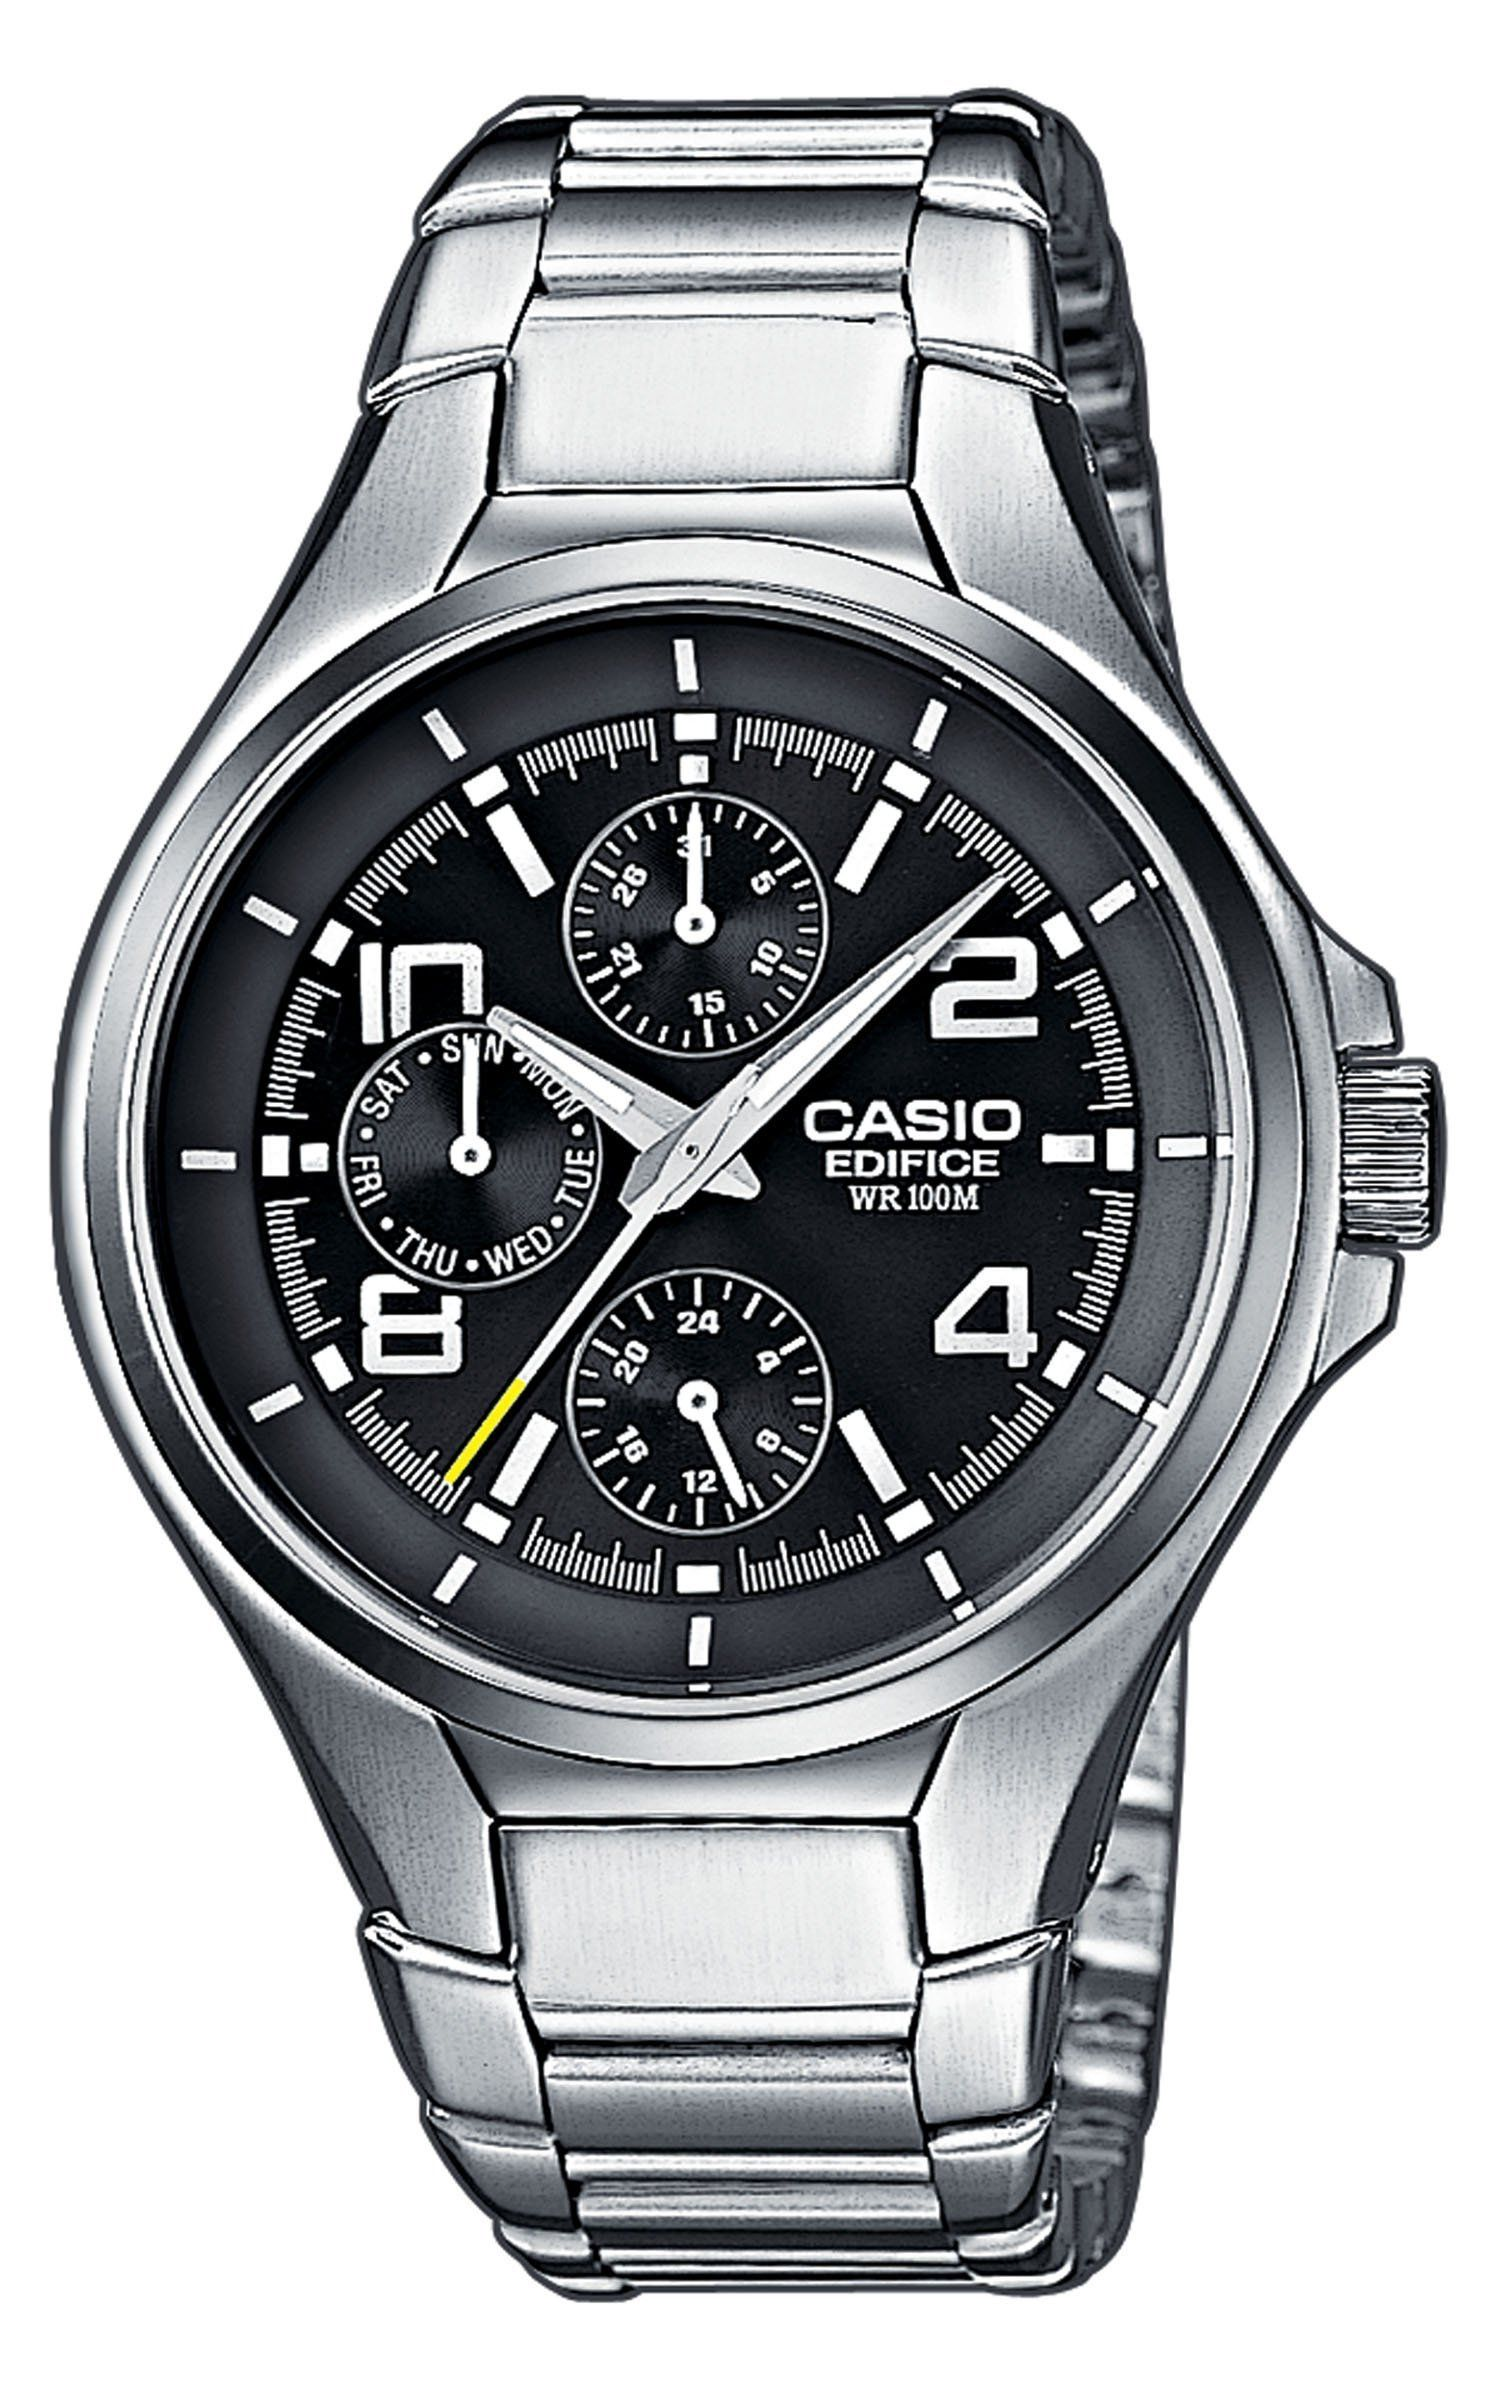 243a48a742c4 CASIO EF-316D-1AVEF Edifice - Reloj de caballero de cuarzo